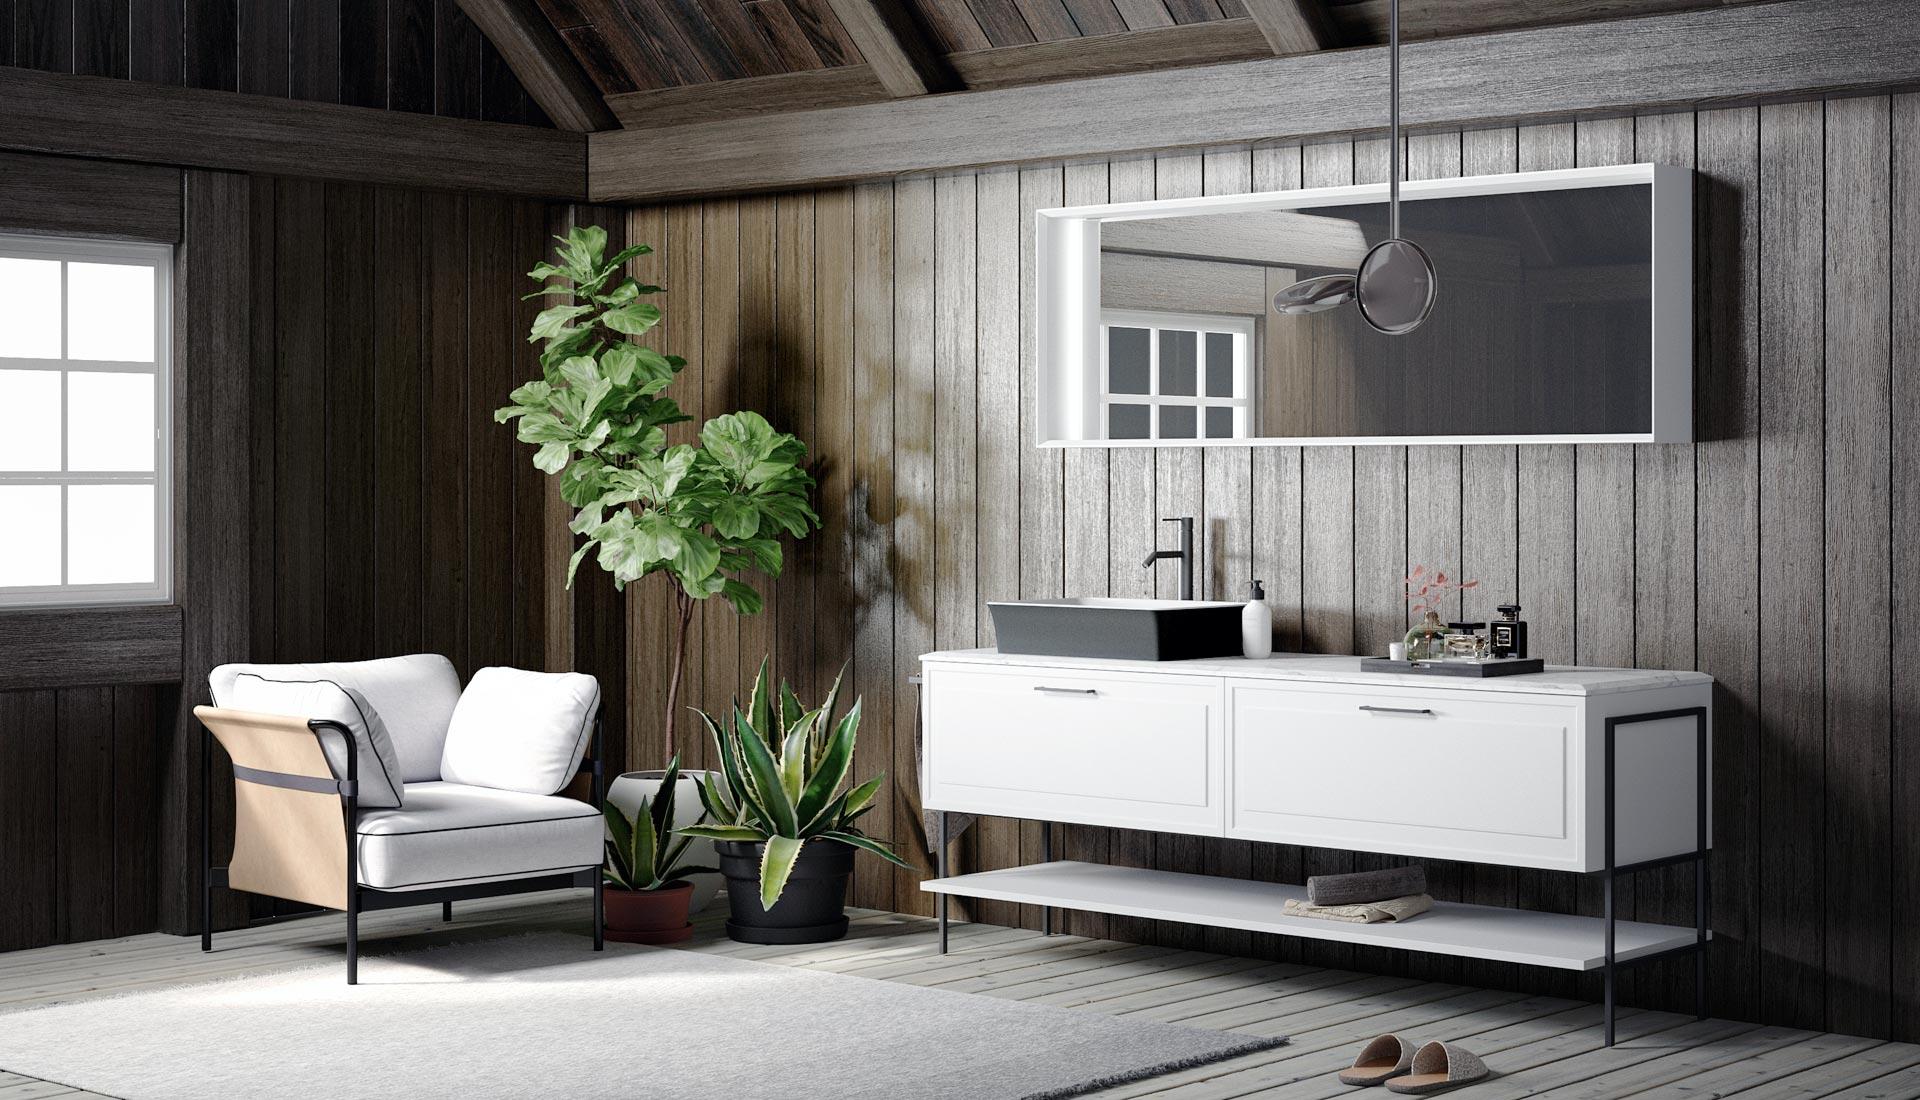 Puntotre bathrooms furniture and bath furnishing ideas